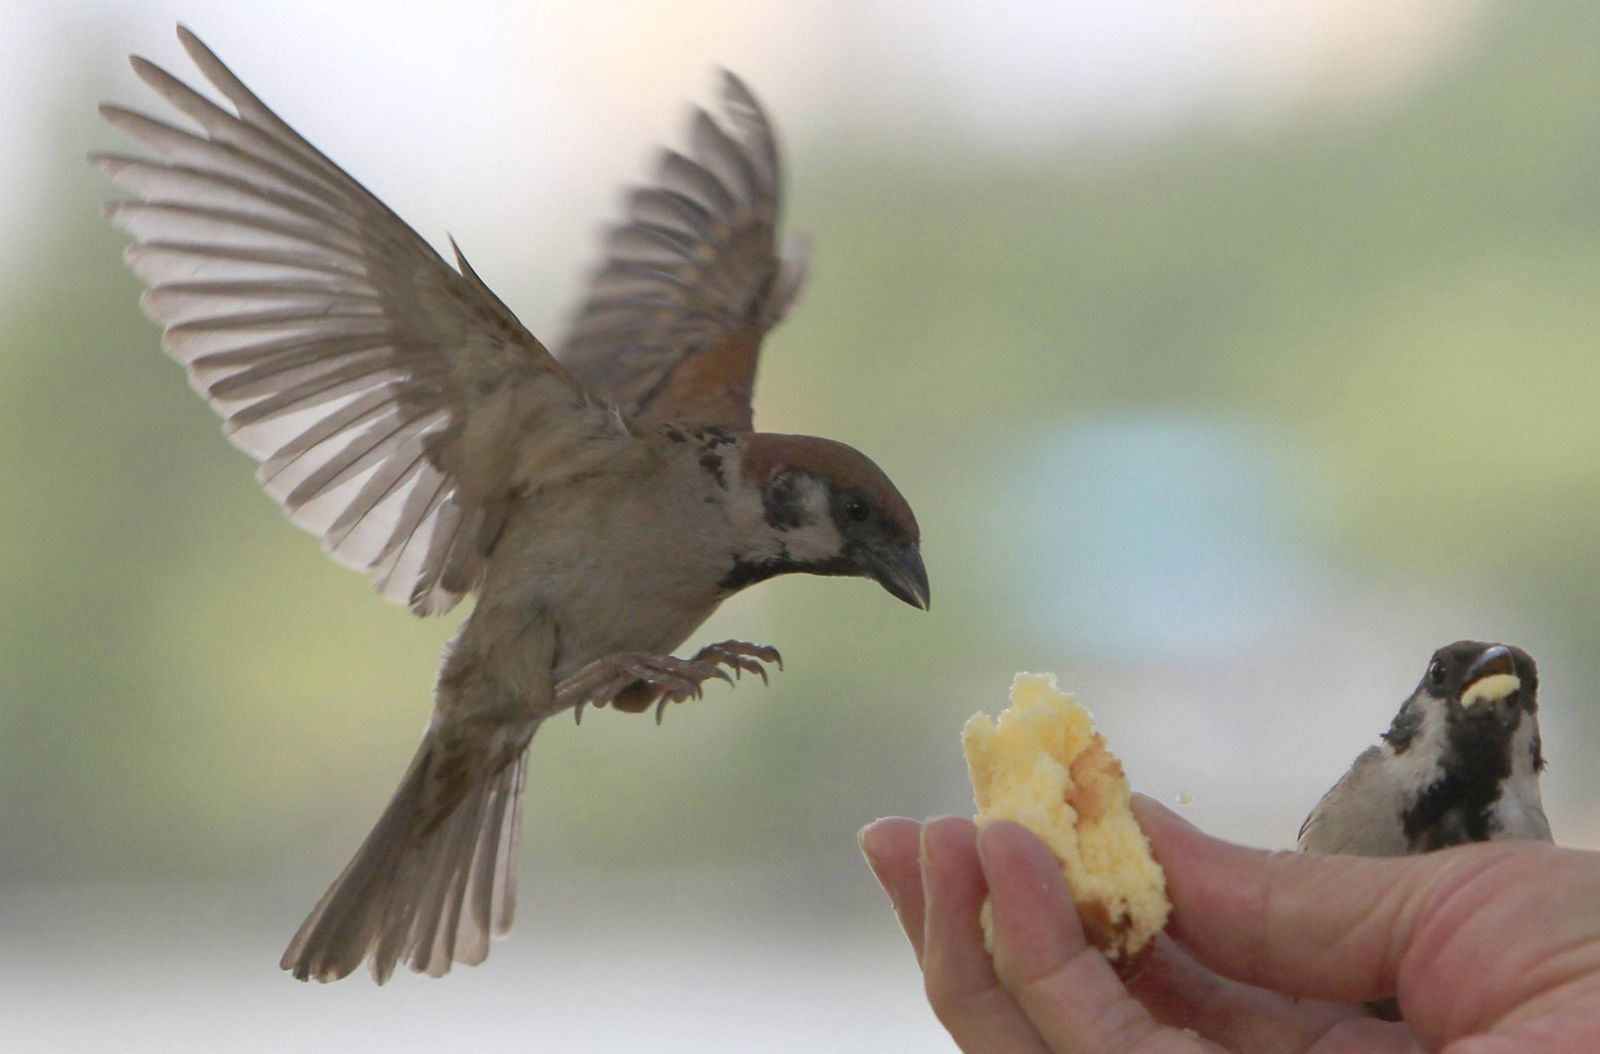 Feeding the brave sparrows in Ueno Park, Tokyo, Japan